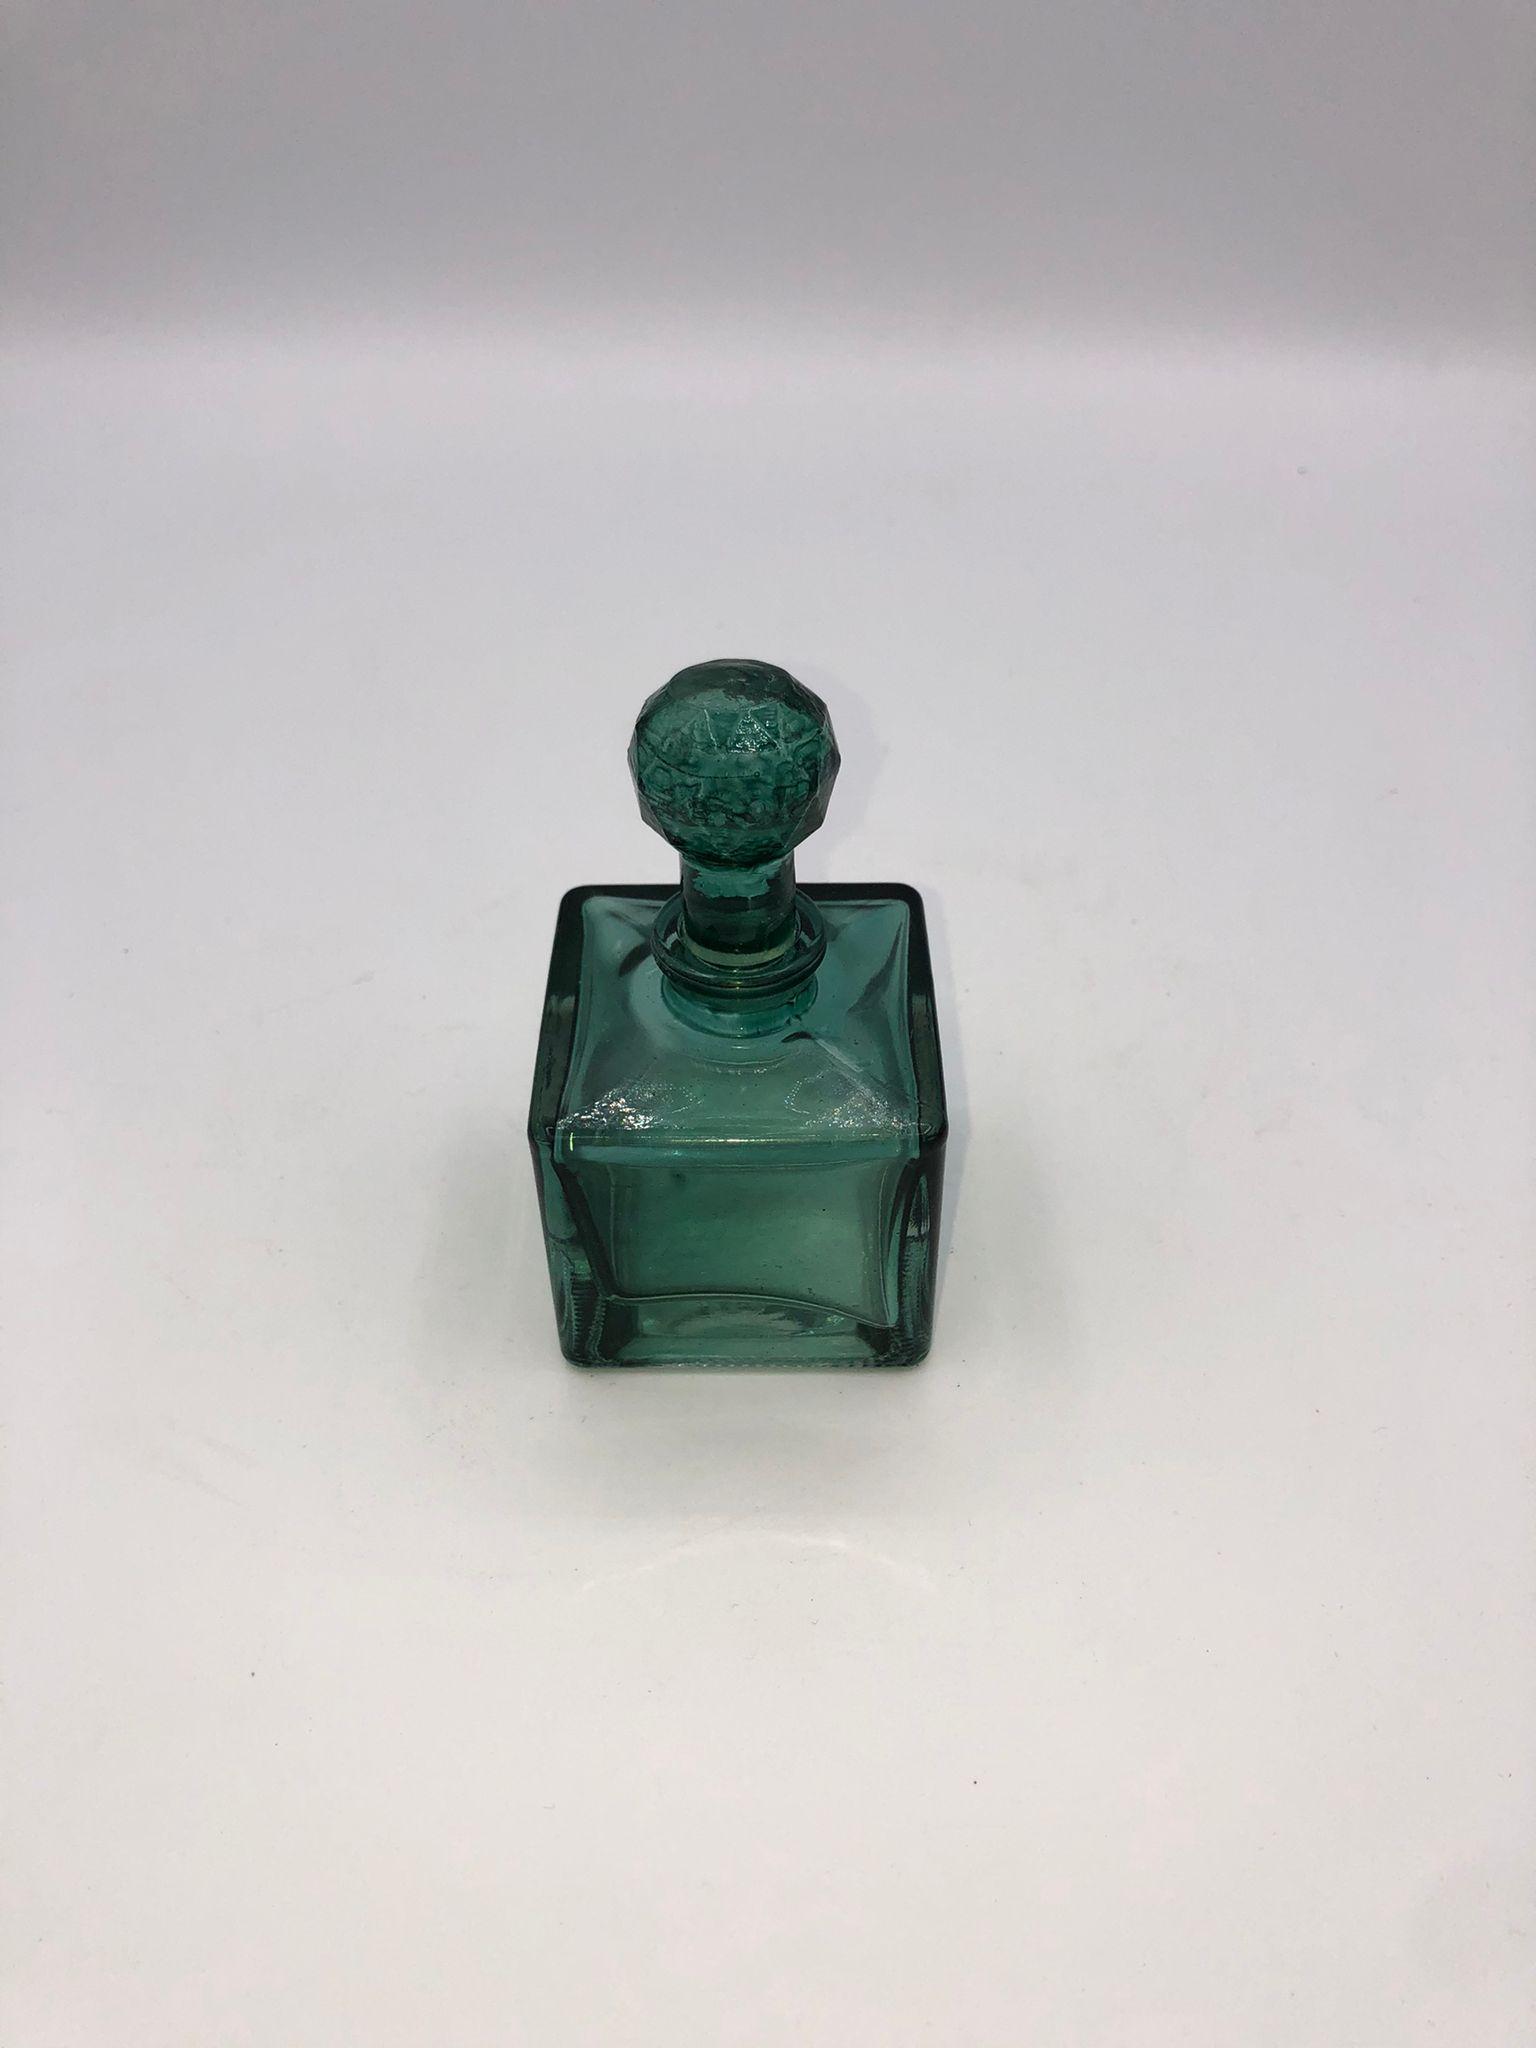 Frasco perfume verde cuadrado 1